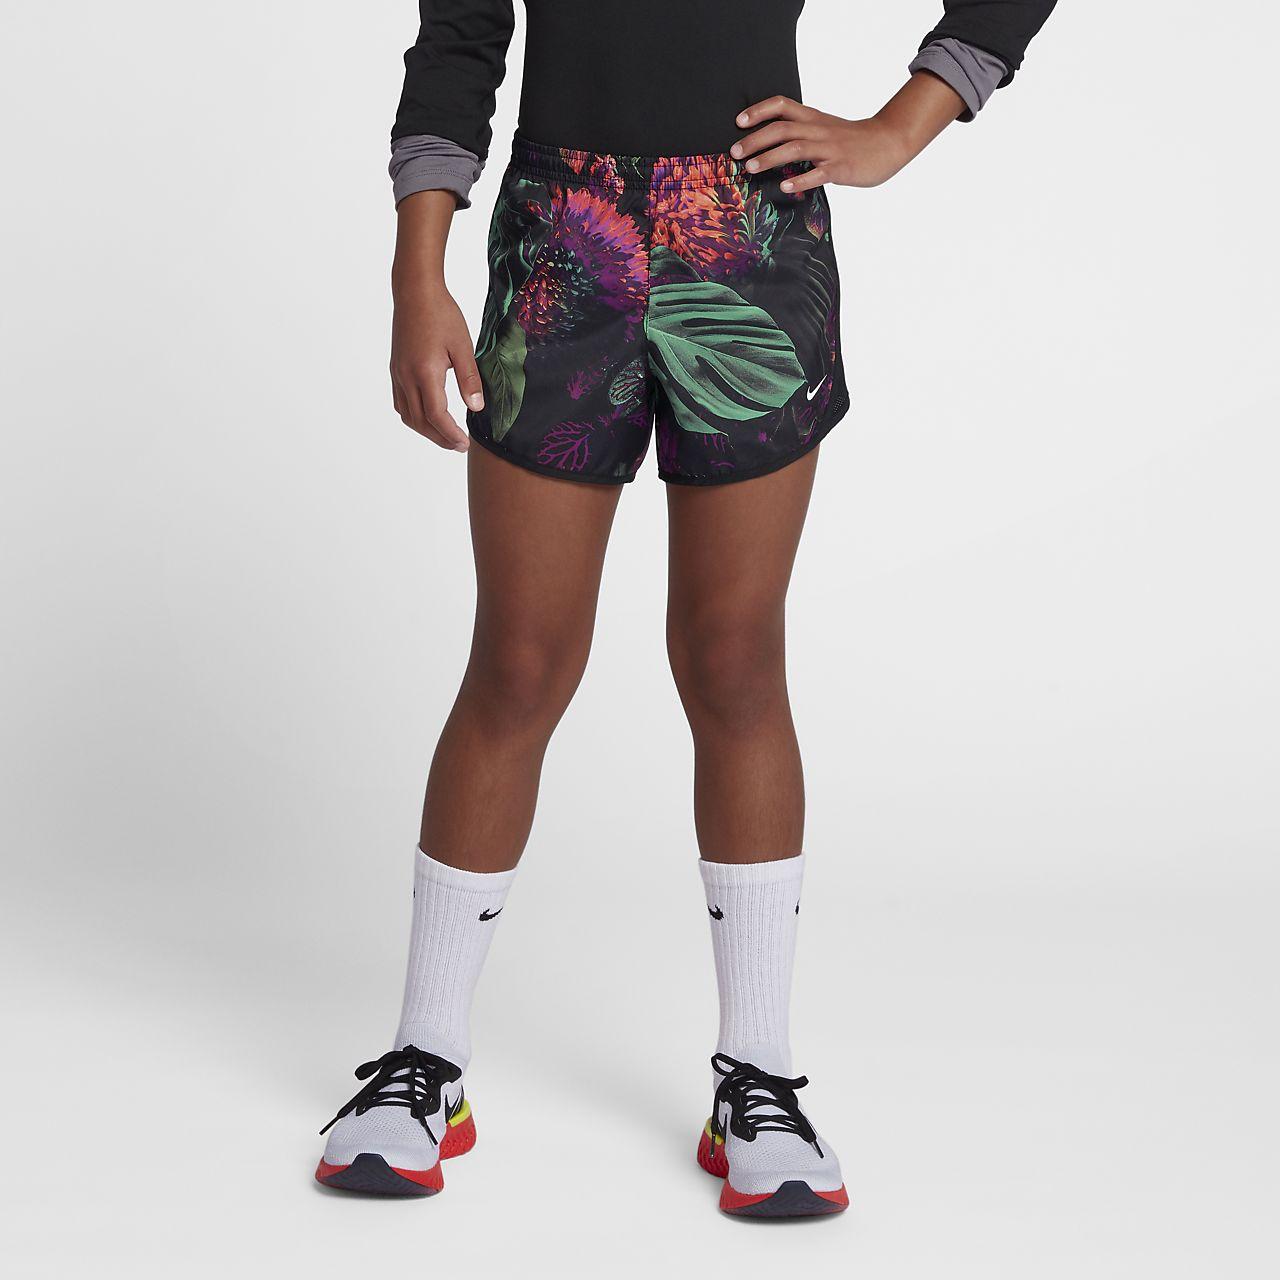 d5a07f04b279 Nike Dri-FIT Tempo Older Kids  (Girls ) Printed Running Shorts. Nike ...